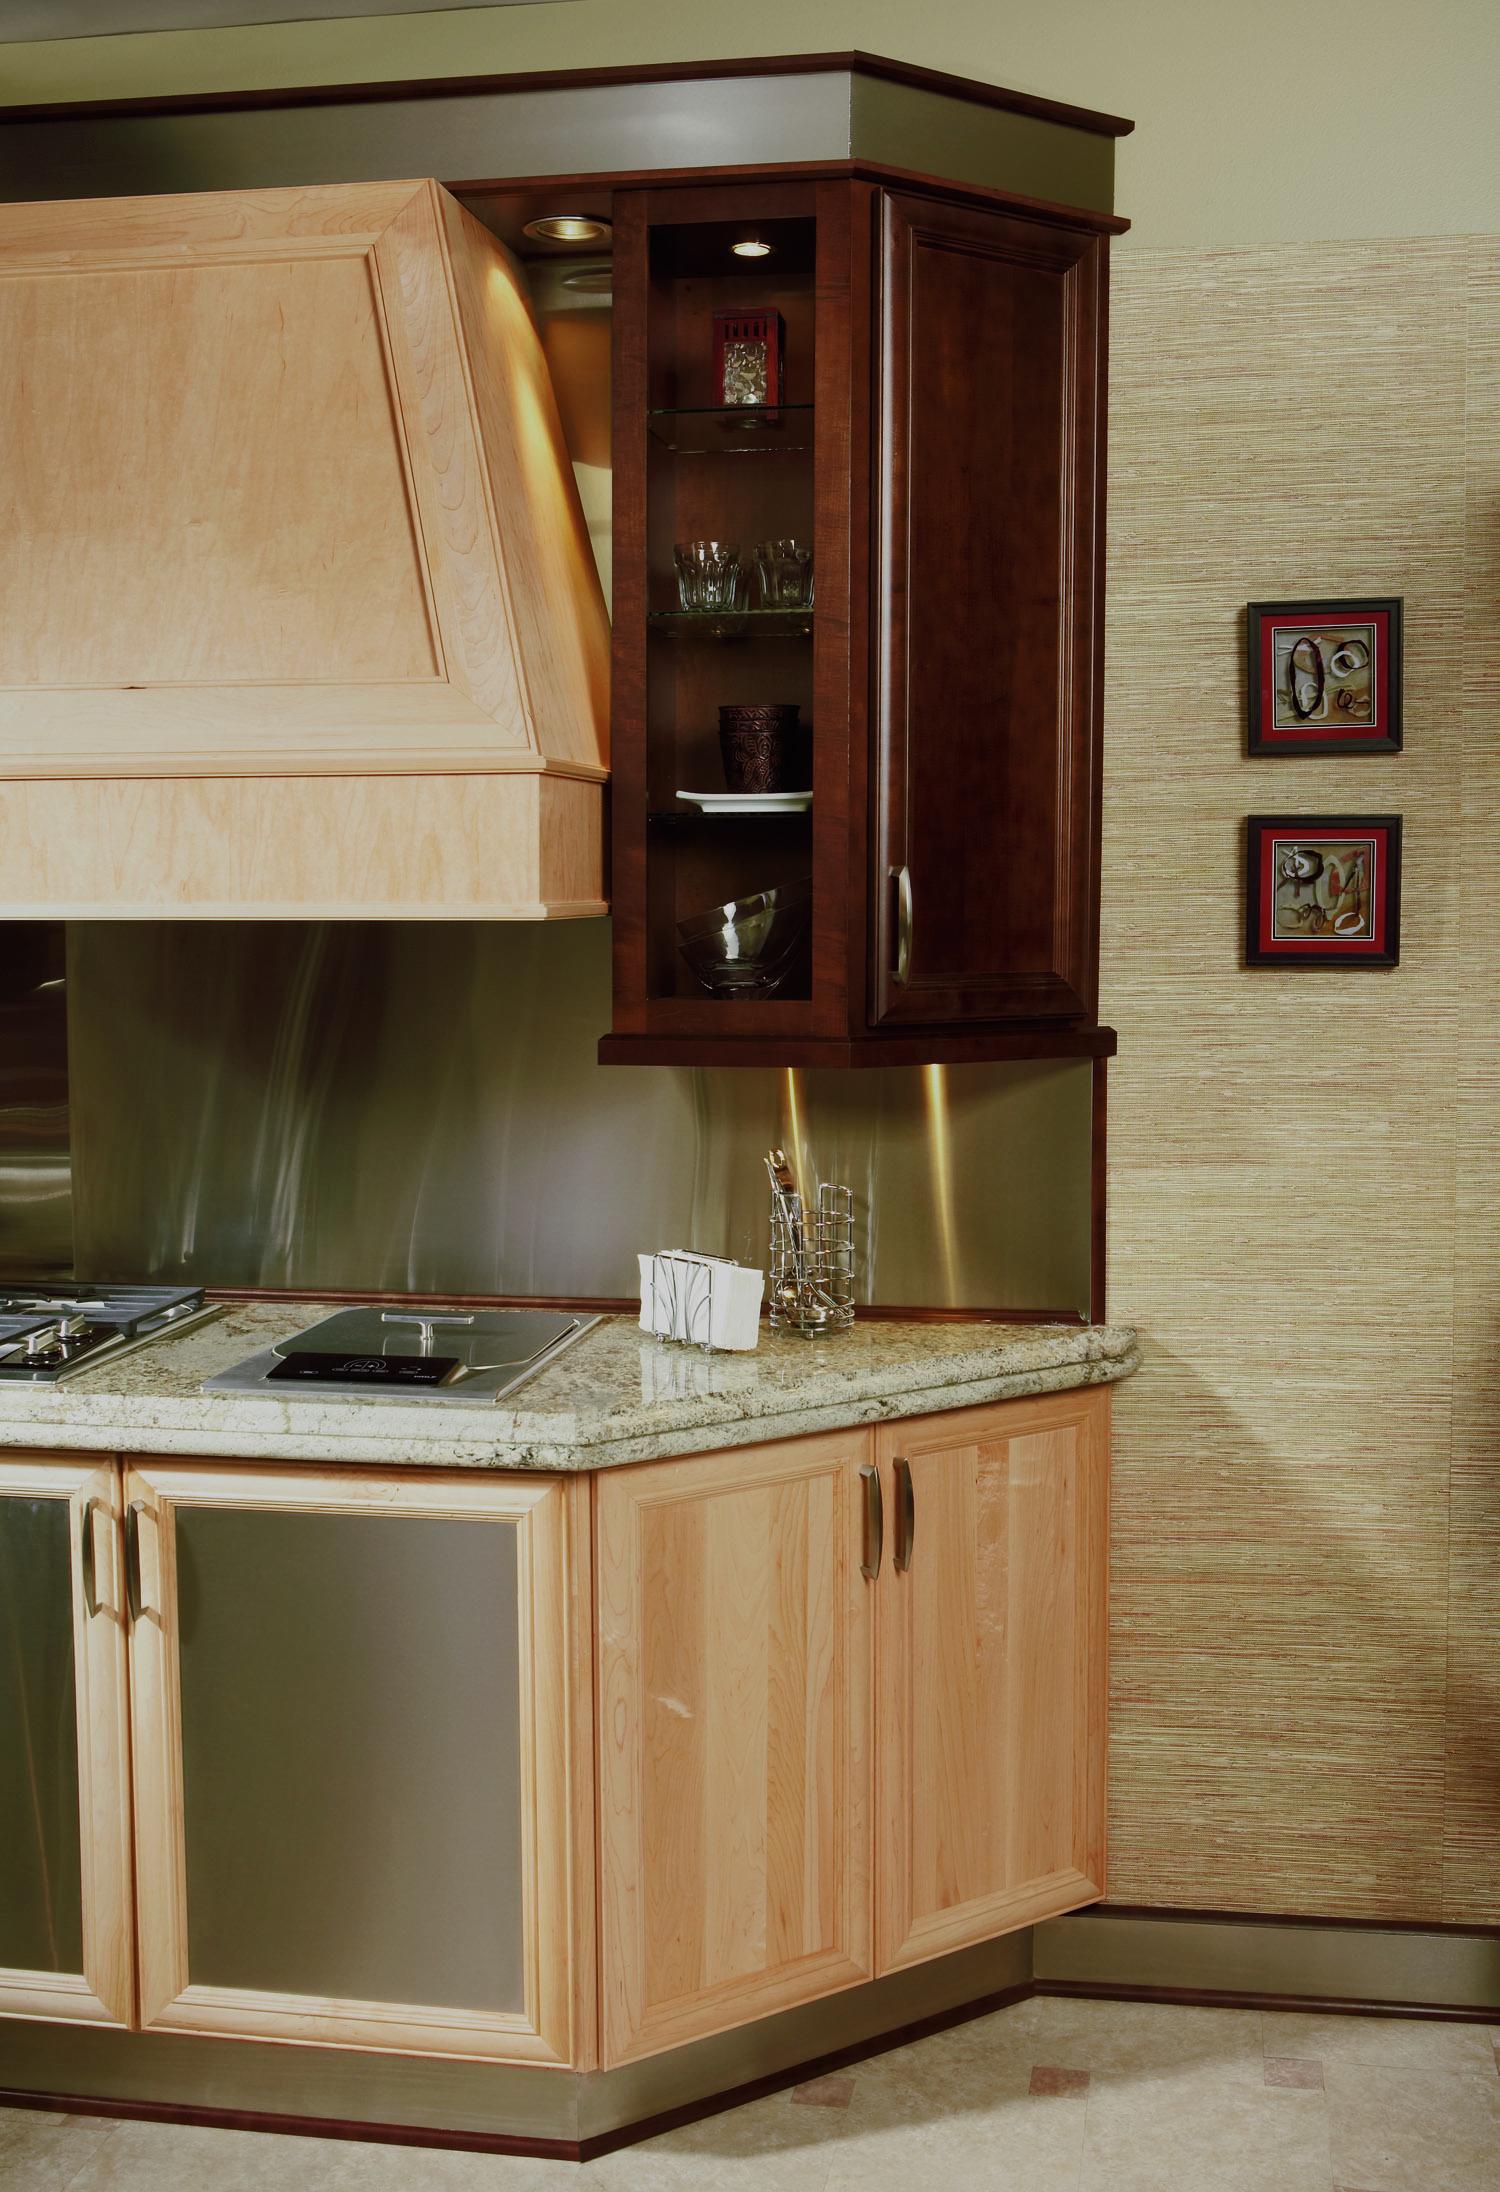 SDY_MPL_SEA and NAT Kitchen.jpg